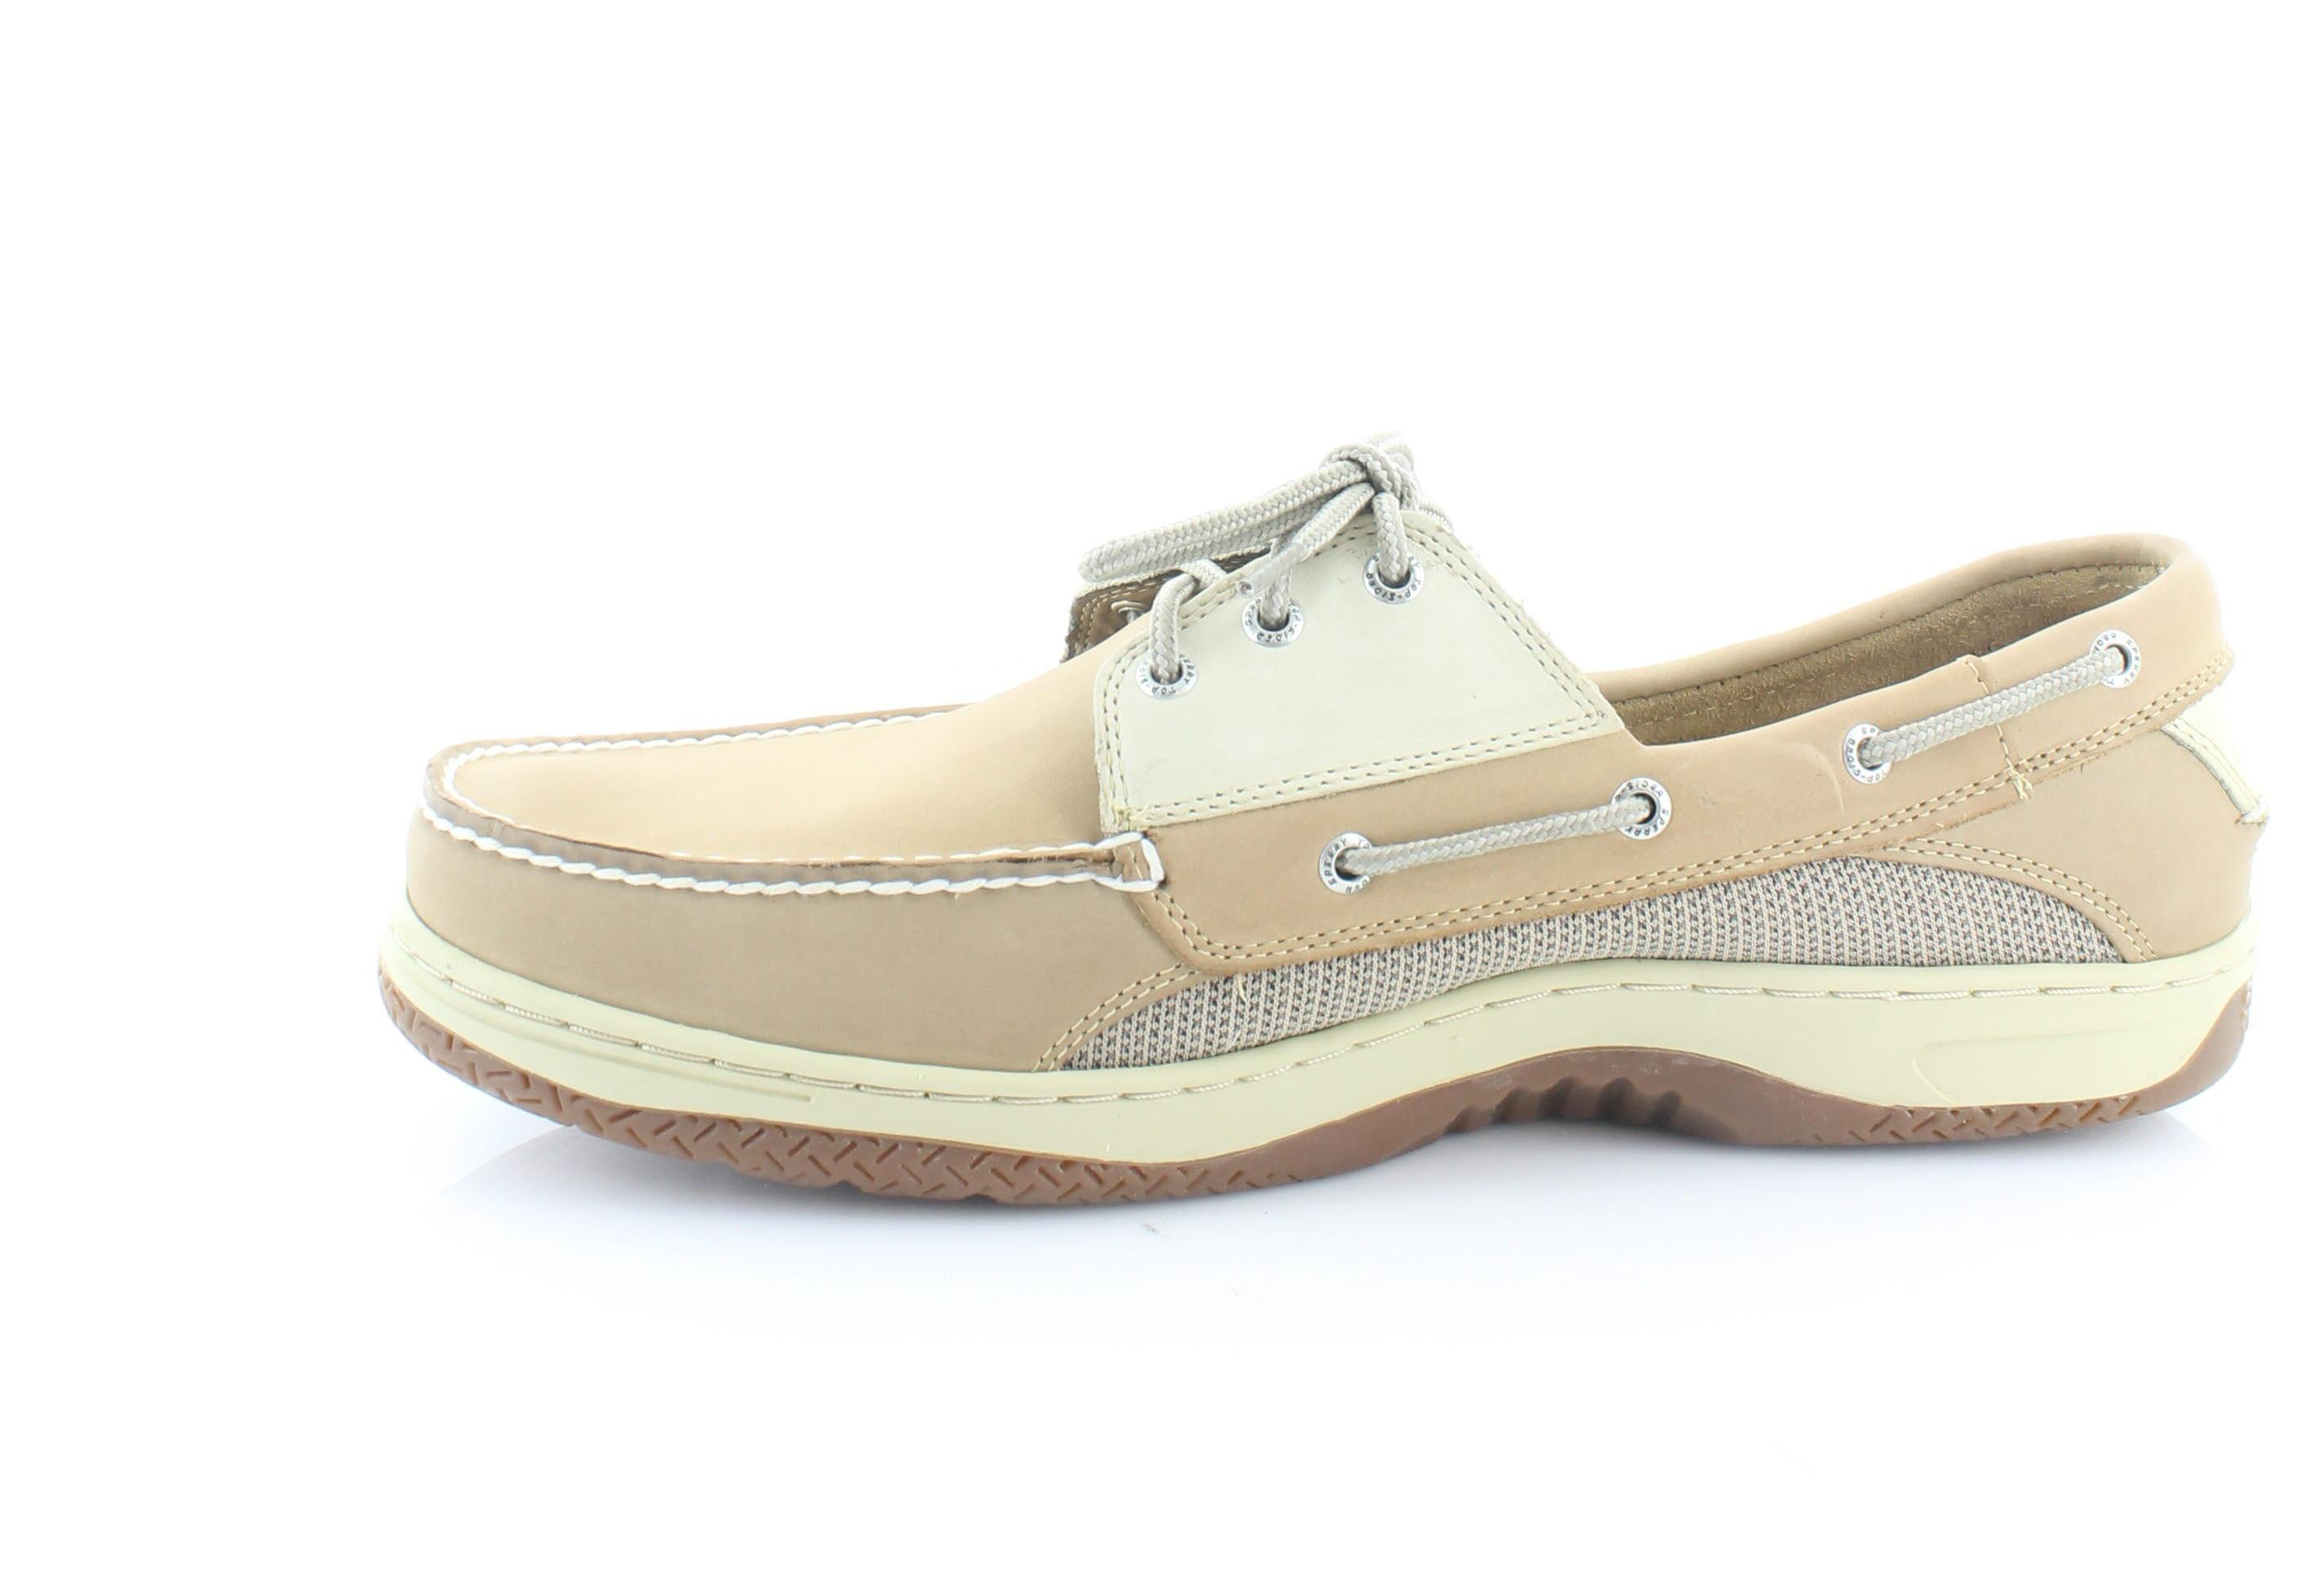 Sperry Top Sider Mens Billfish Ultralite 3-Eye Boat Shoe